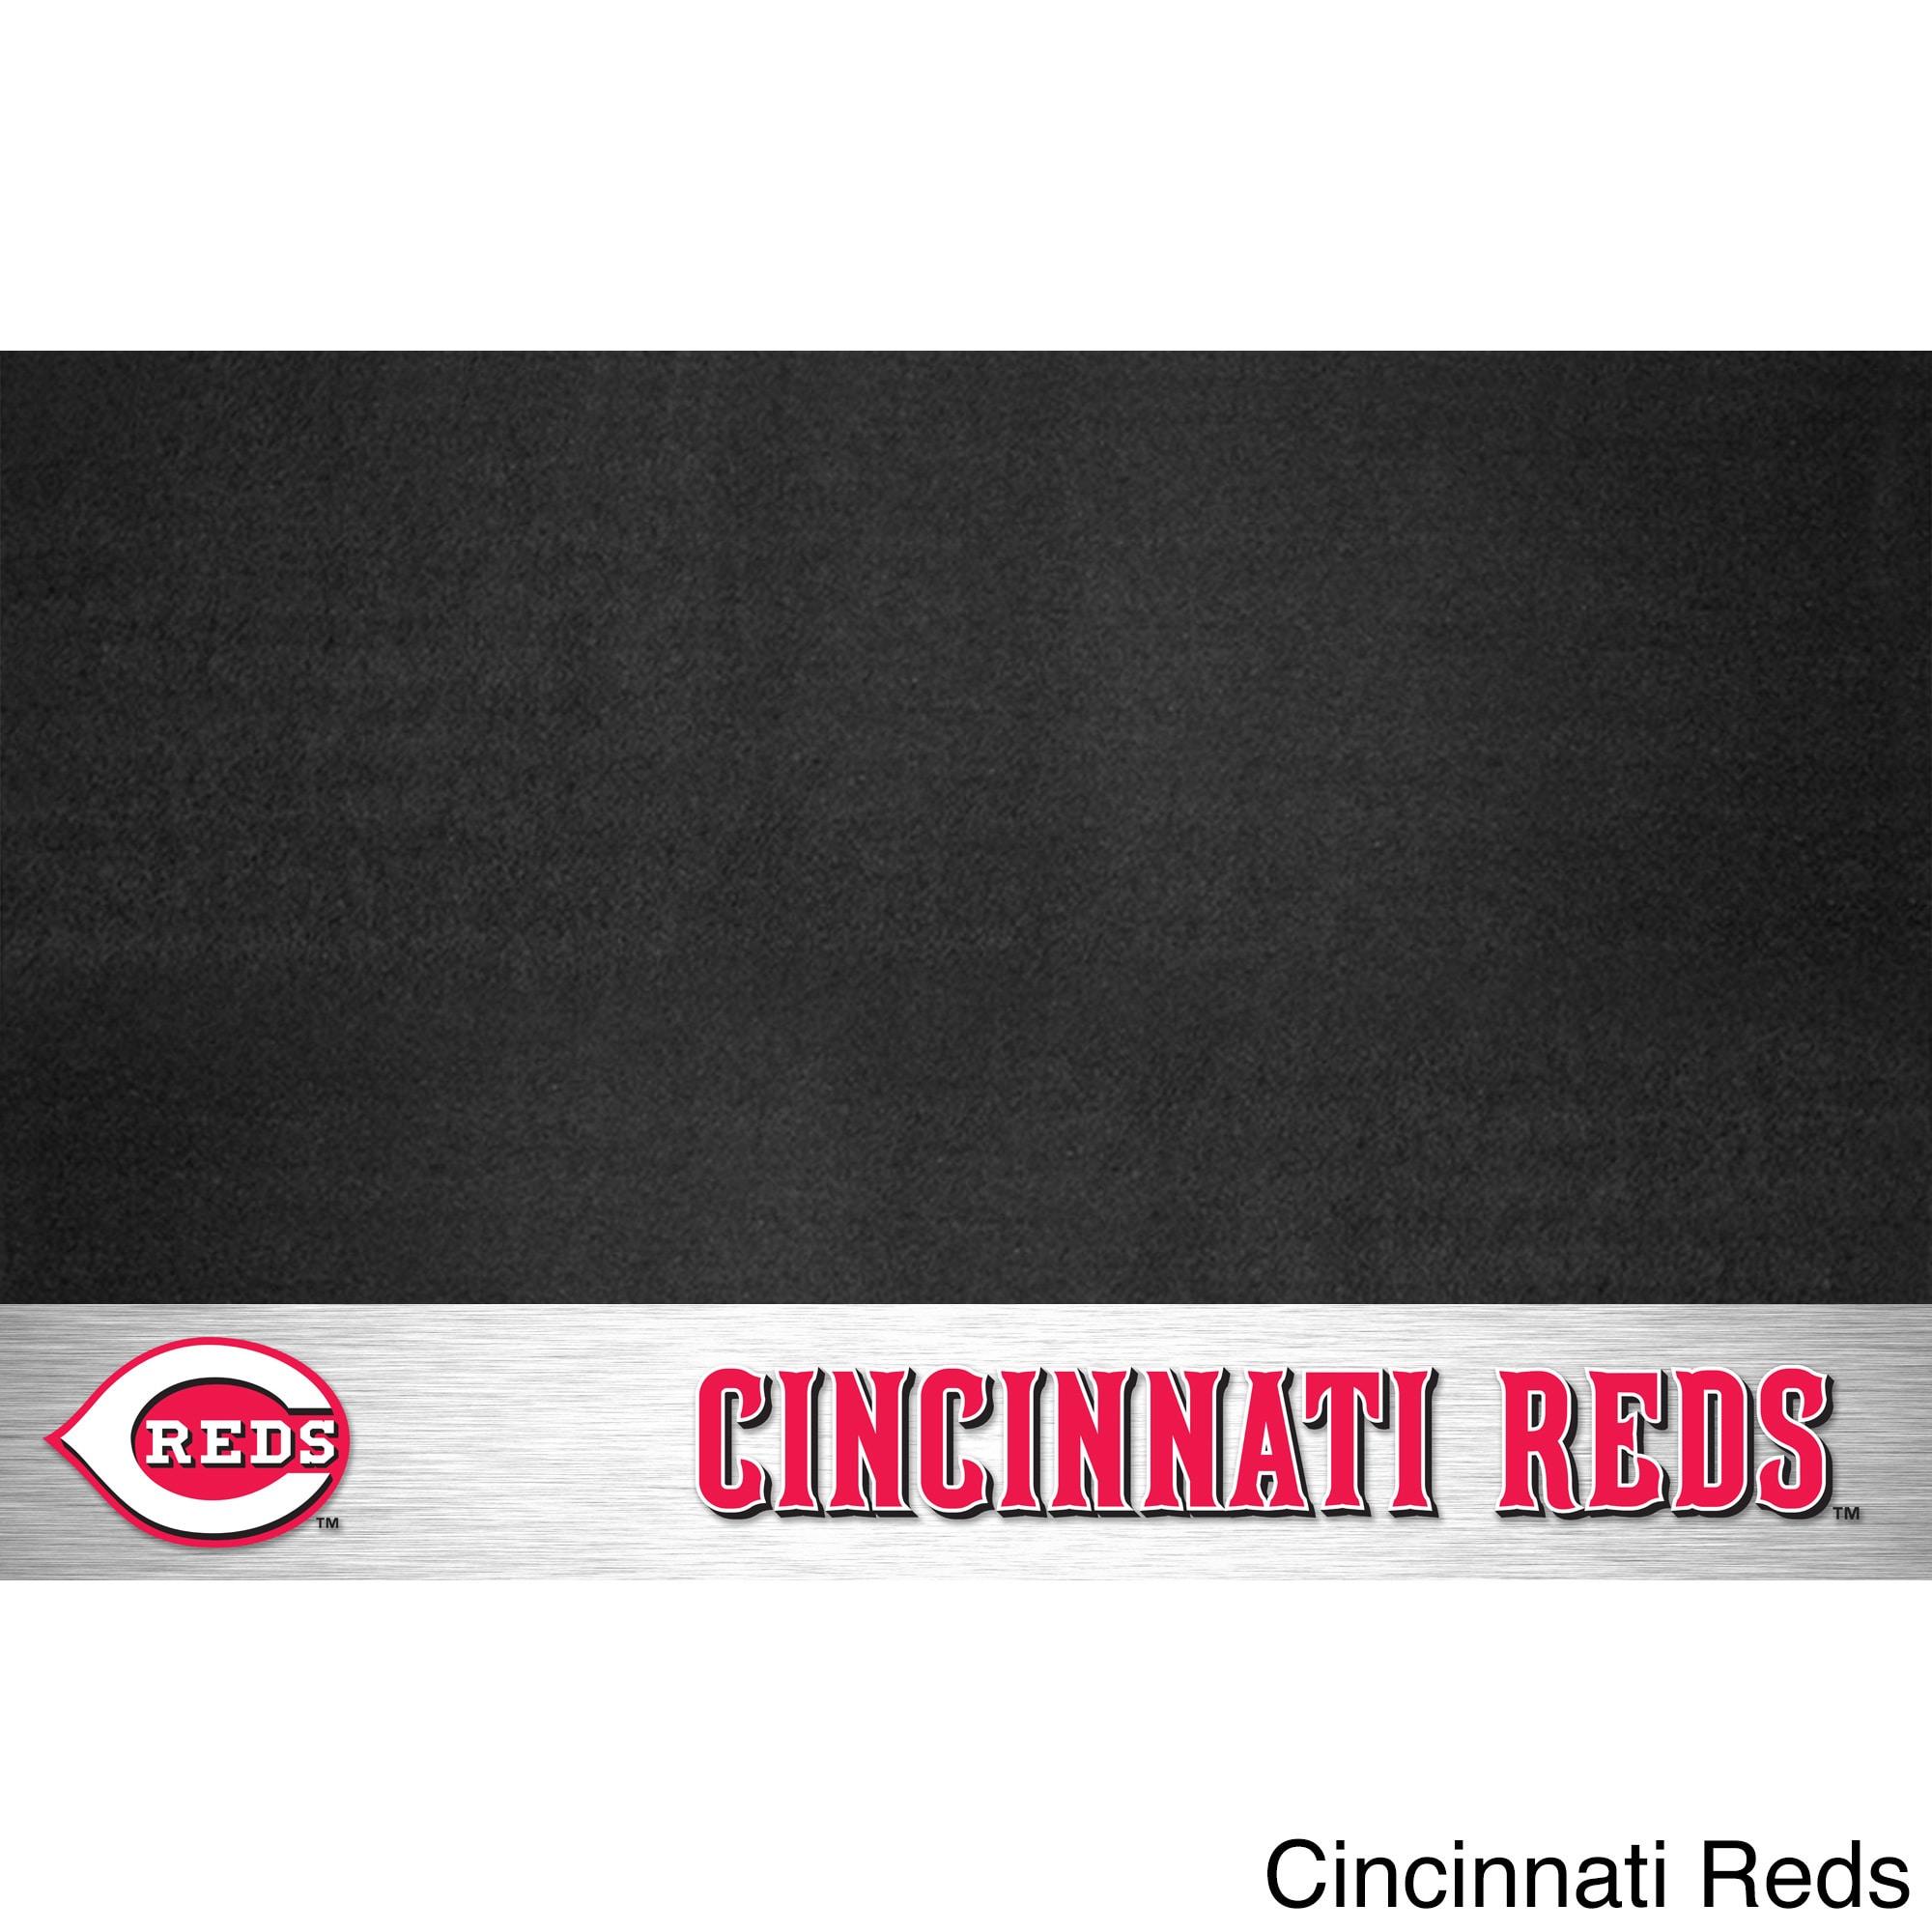 Fanmats MLB Grill Mat (Cincinnati Reds), Black